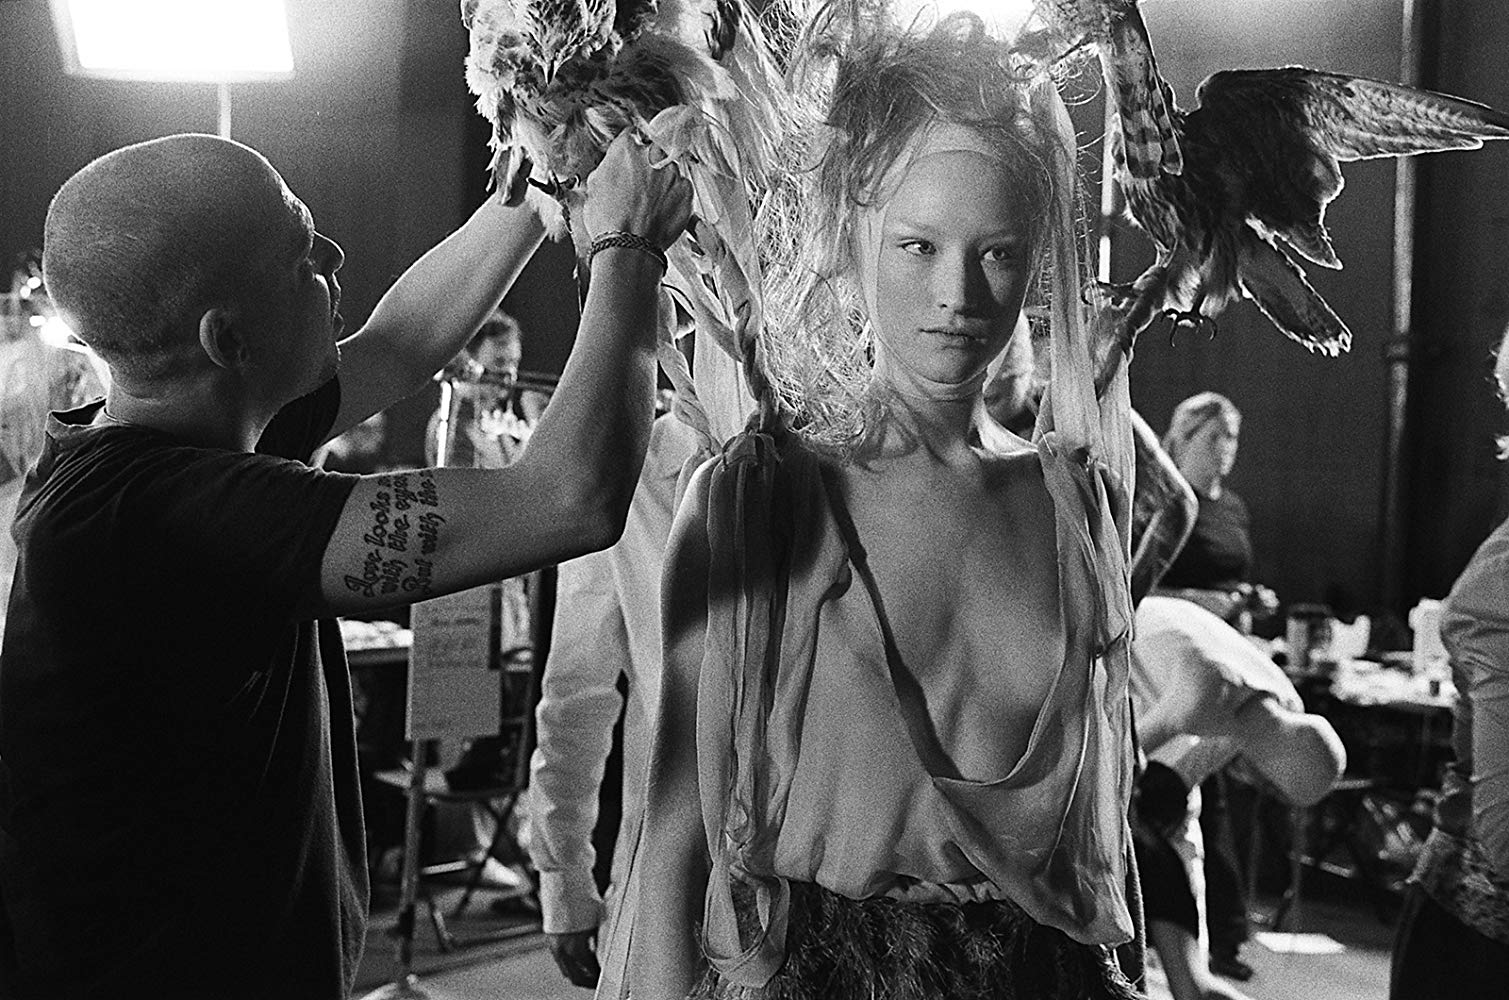 Alexander McQueen - Il genio della moda: Alexander McQueen una scena